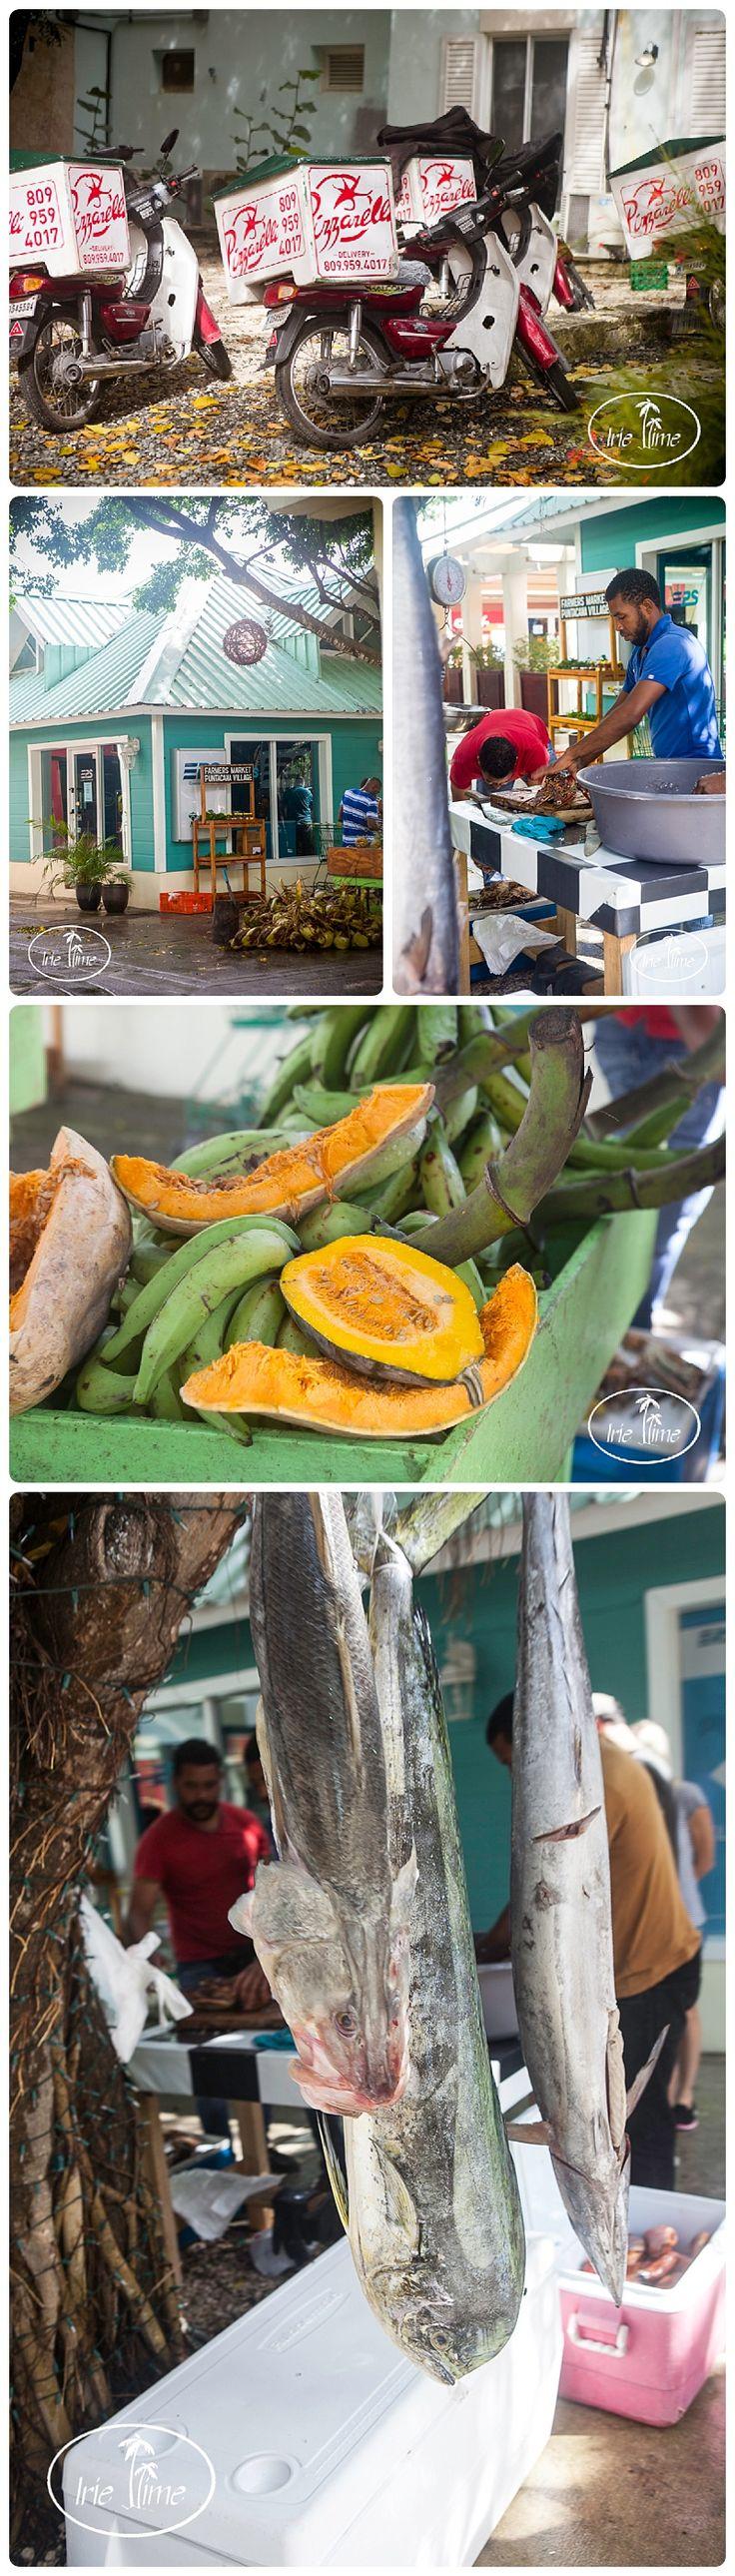 Puntacana Village Shops, Restaurants & Market My Irie